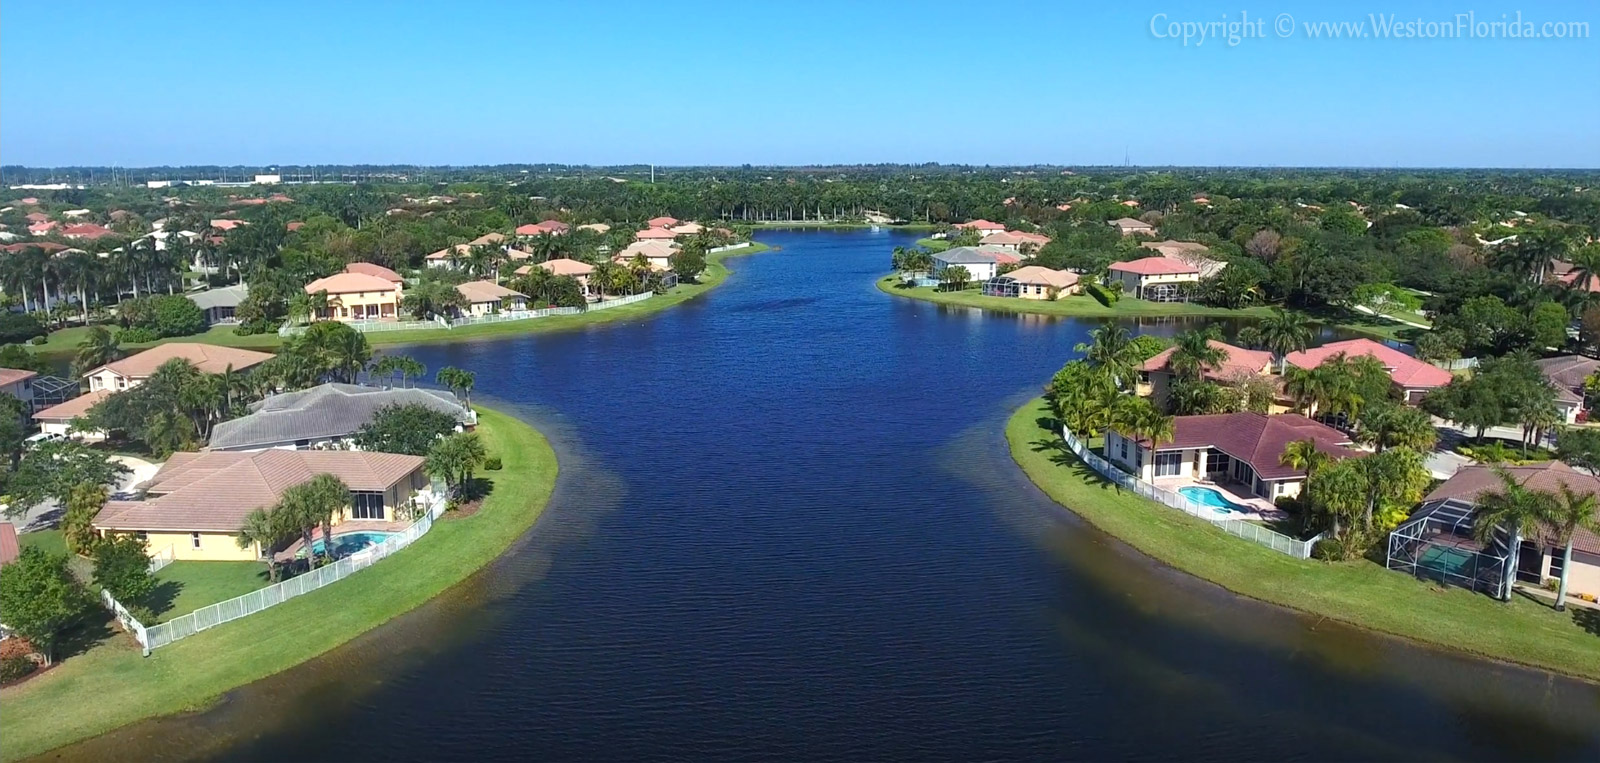 Amazing aerial view of Weston Florida